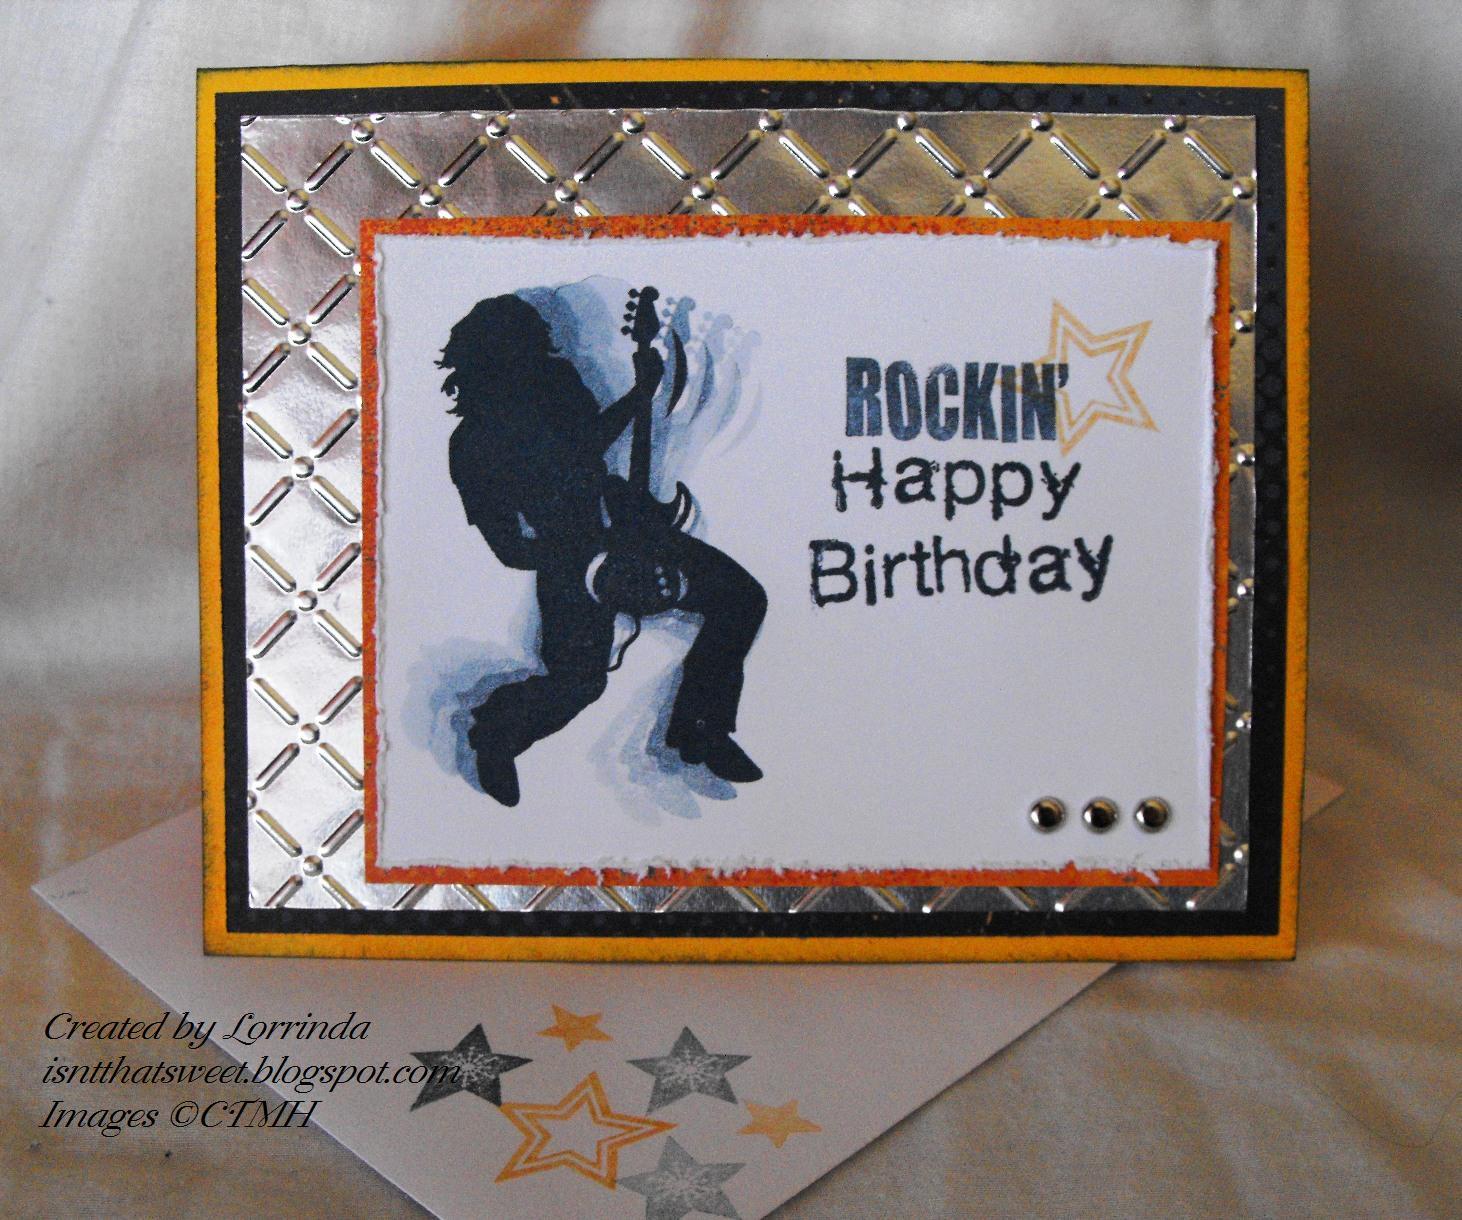 isn't that sweet? hh challenge , rockin' birthday card, Birthday card